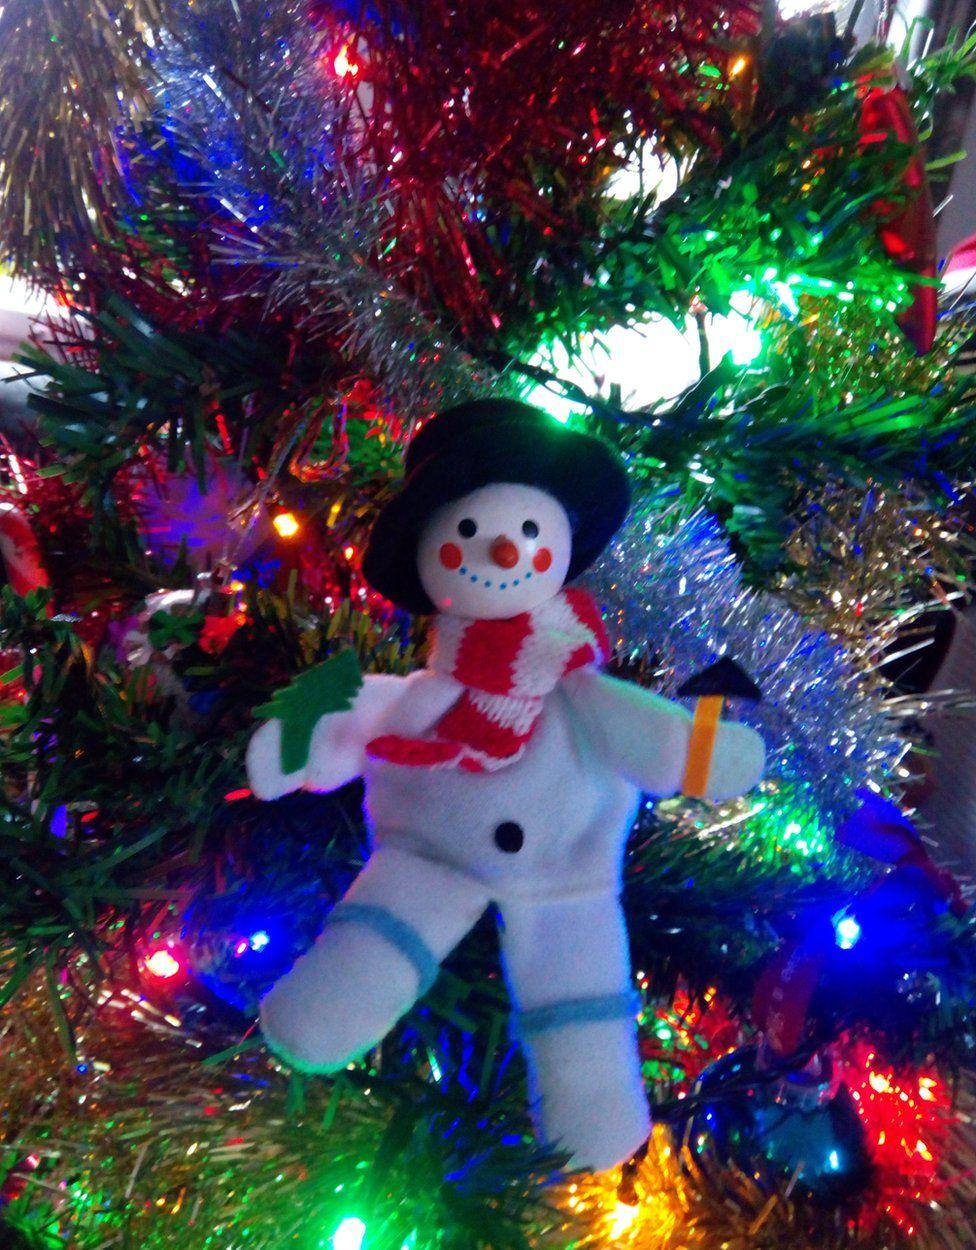 A snowman on a Christmas tree